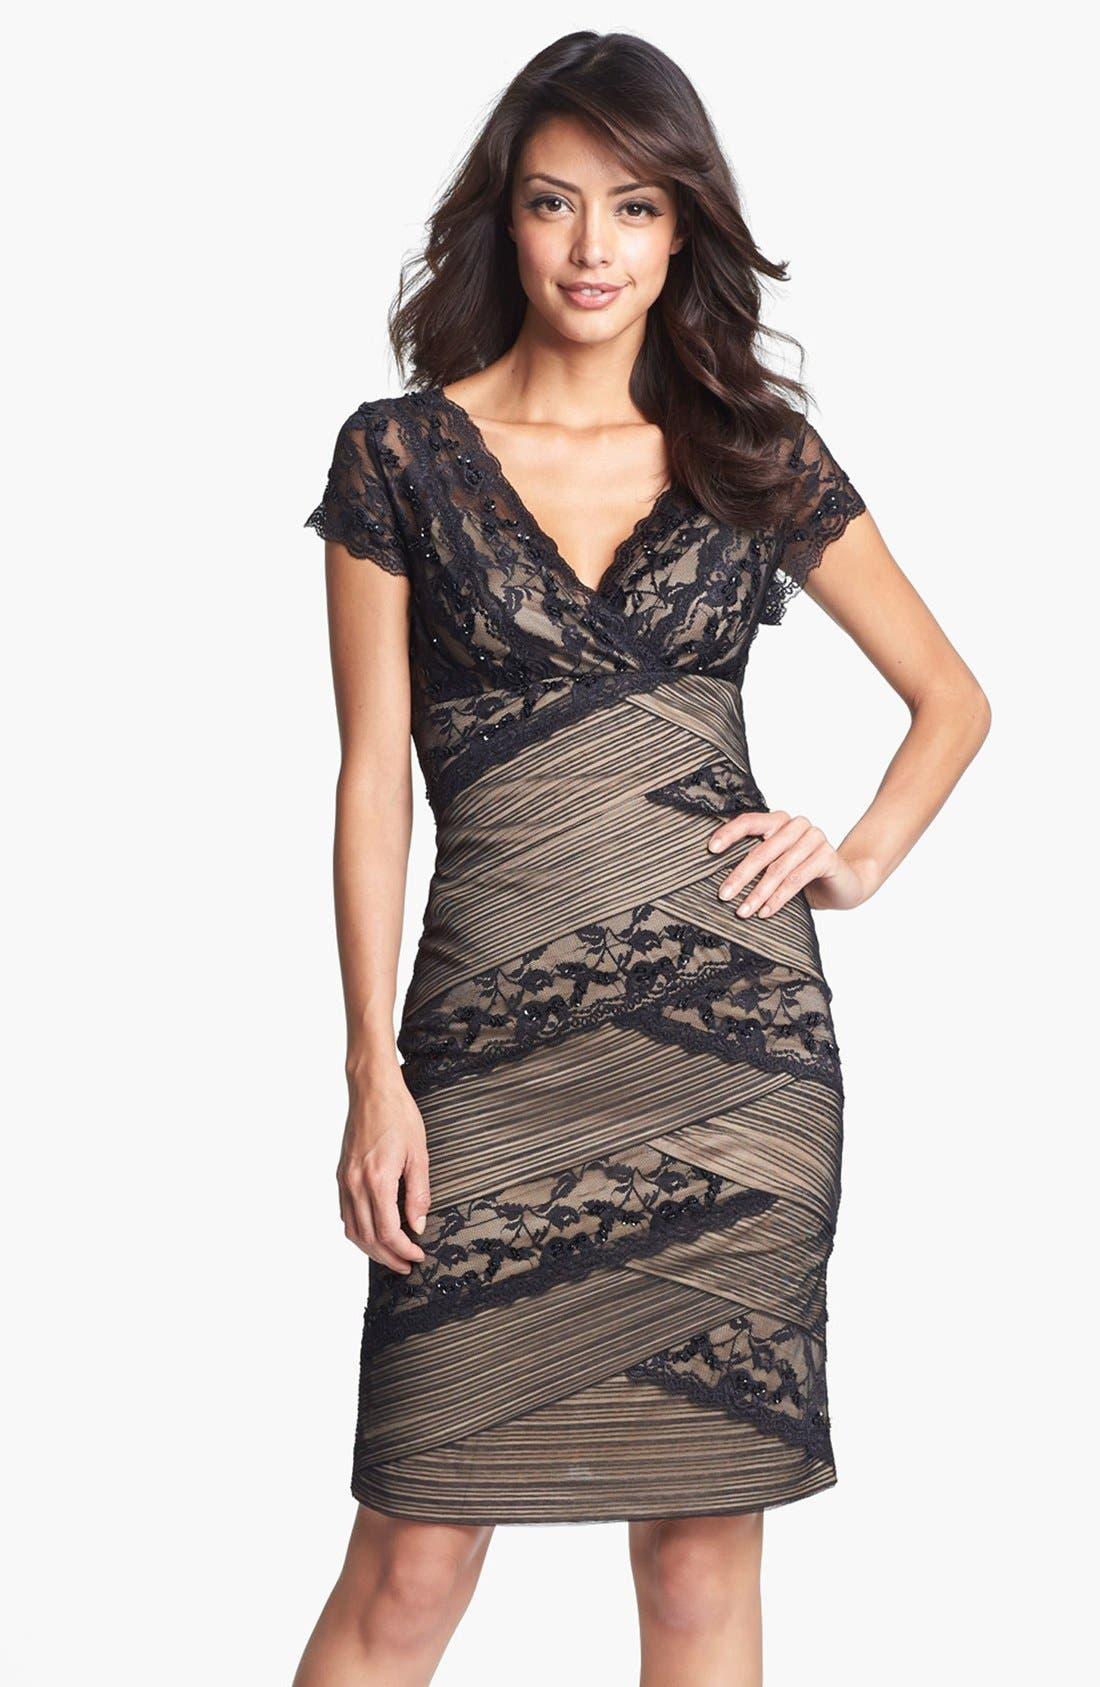 Alternate Image 1 Selected - Marina Mixed Lace Sheath Dress (Regular & Petite)